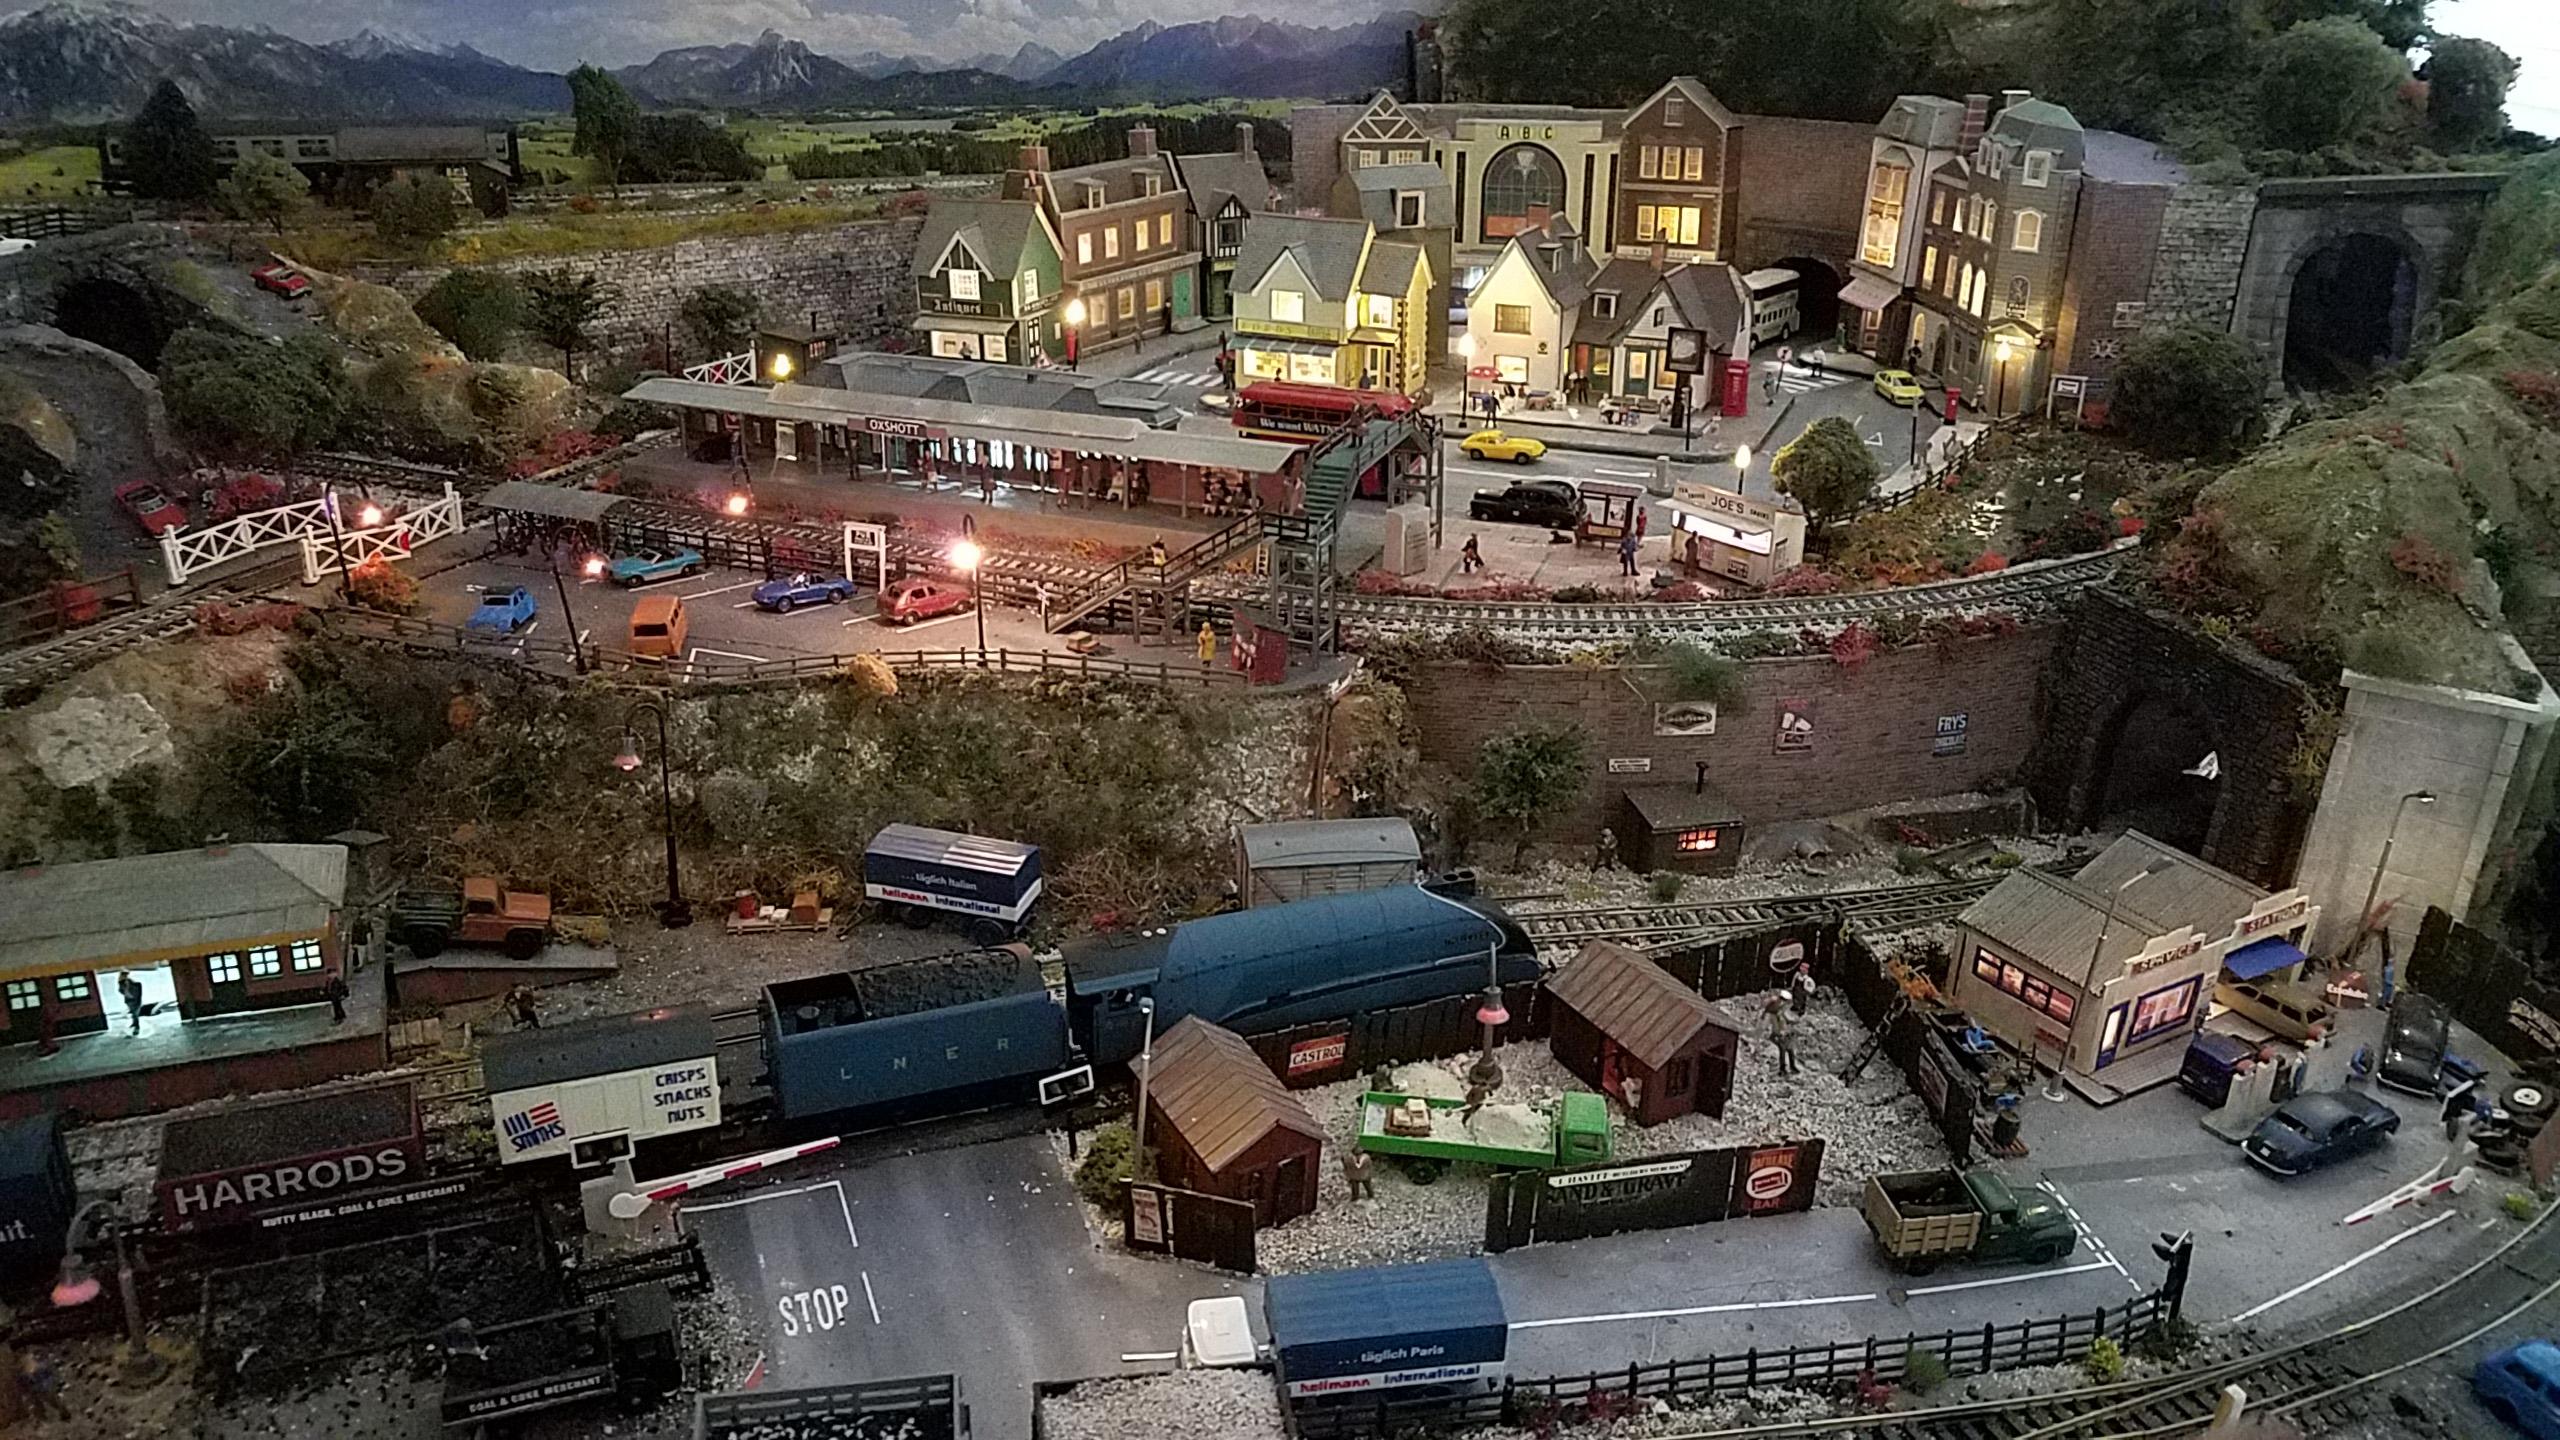 model railway high street